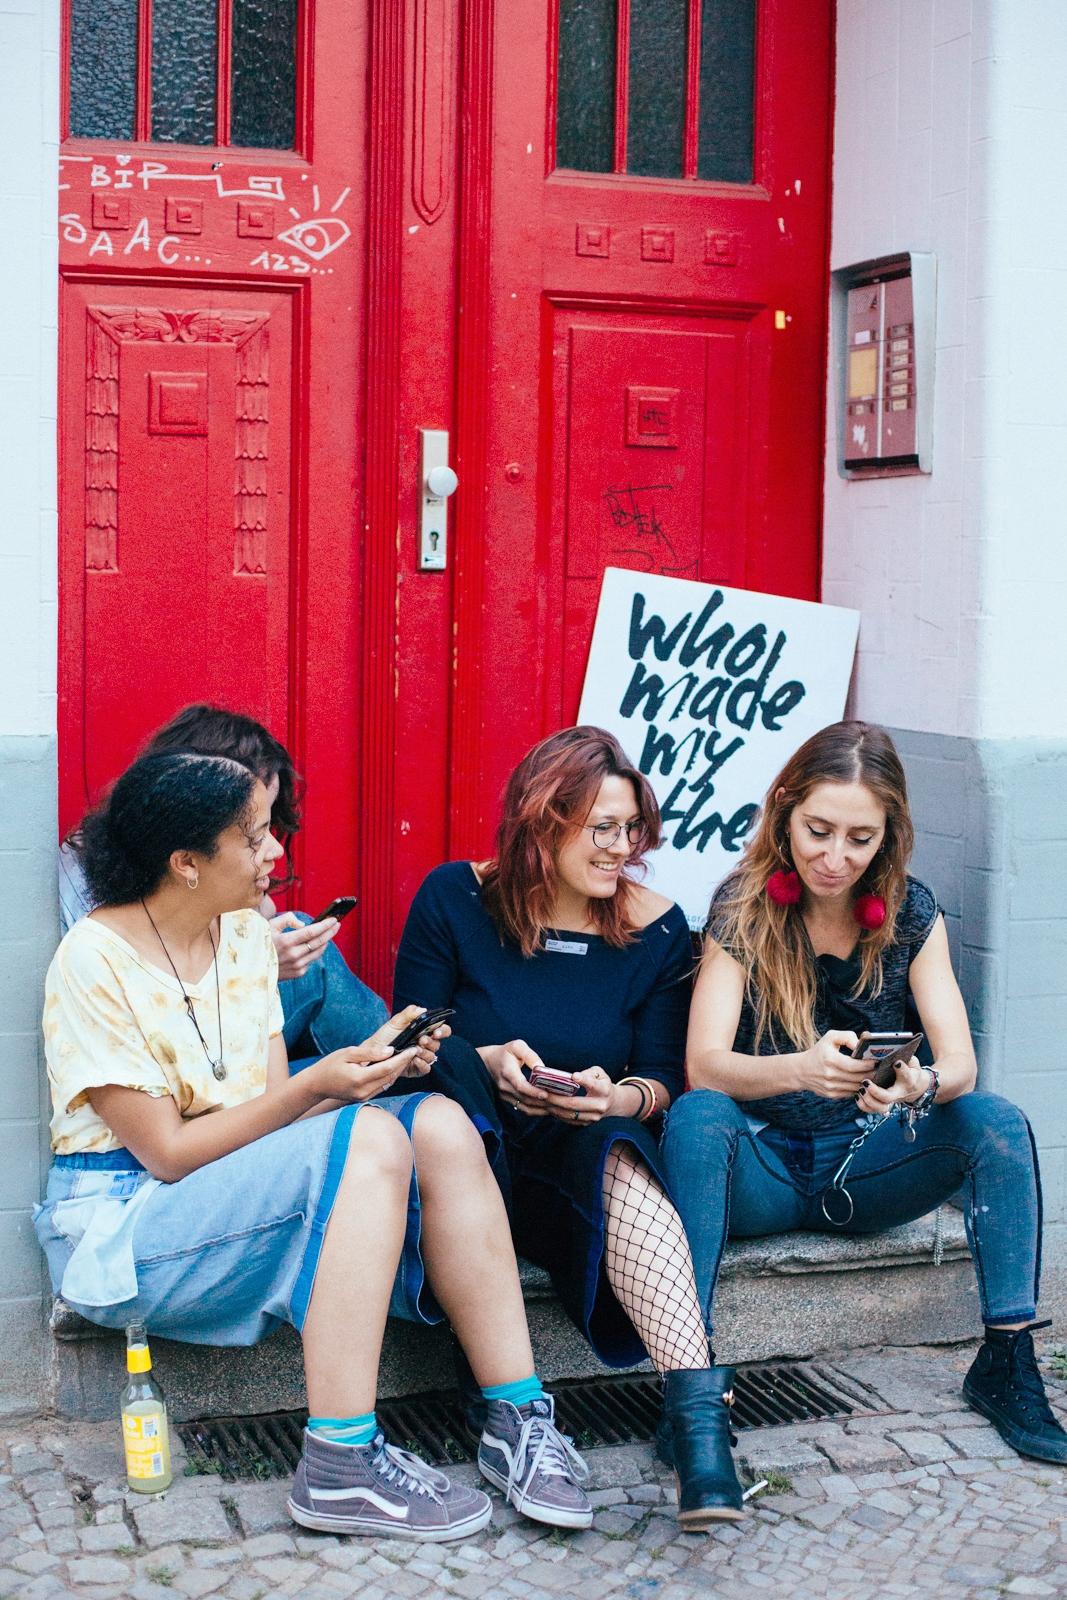 Fashion Revolution Social Media Team at work / ©️Cherie Birkner